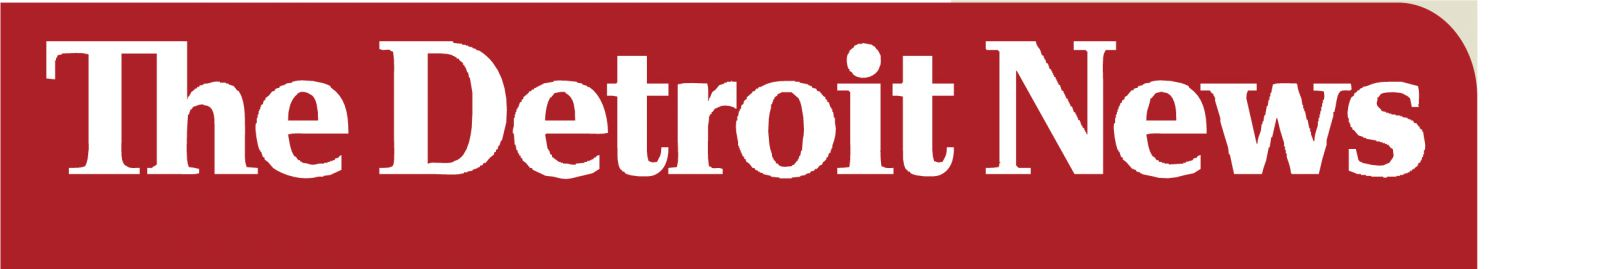 Dan Gilbert committed $500M to Detroit neighborhoods. Here's the immediate impact